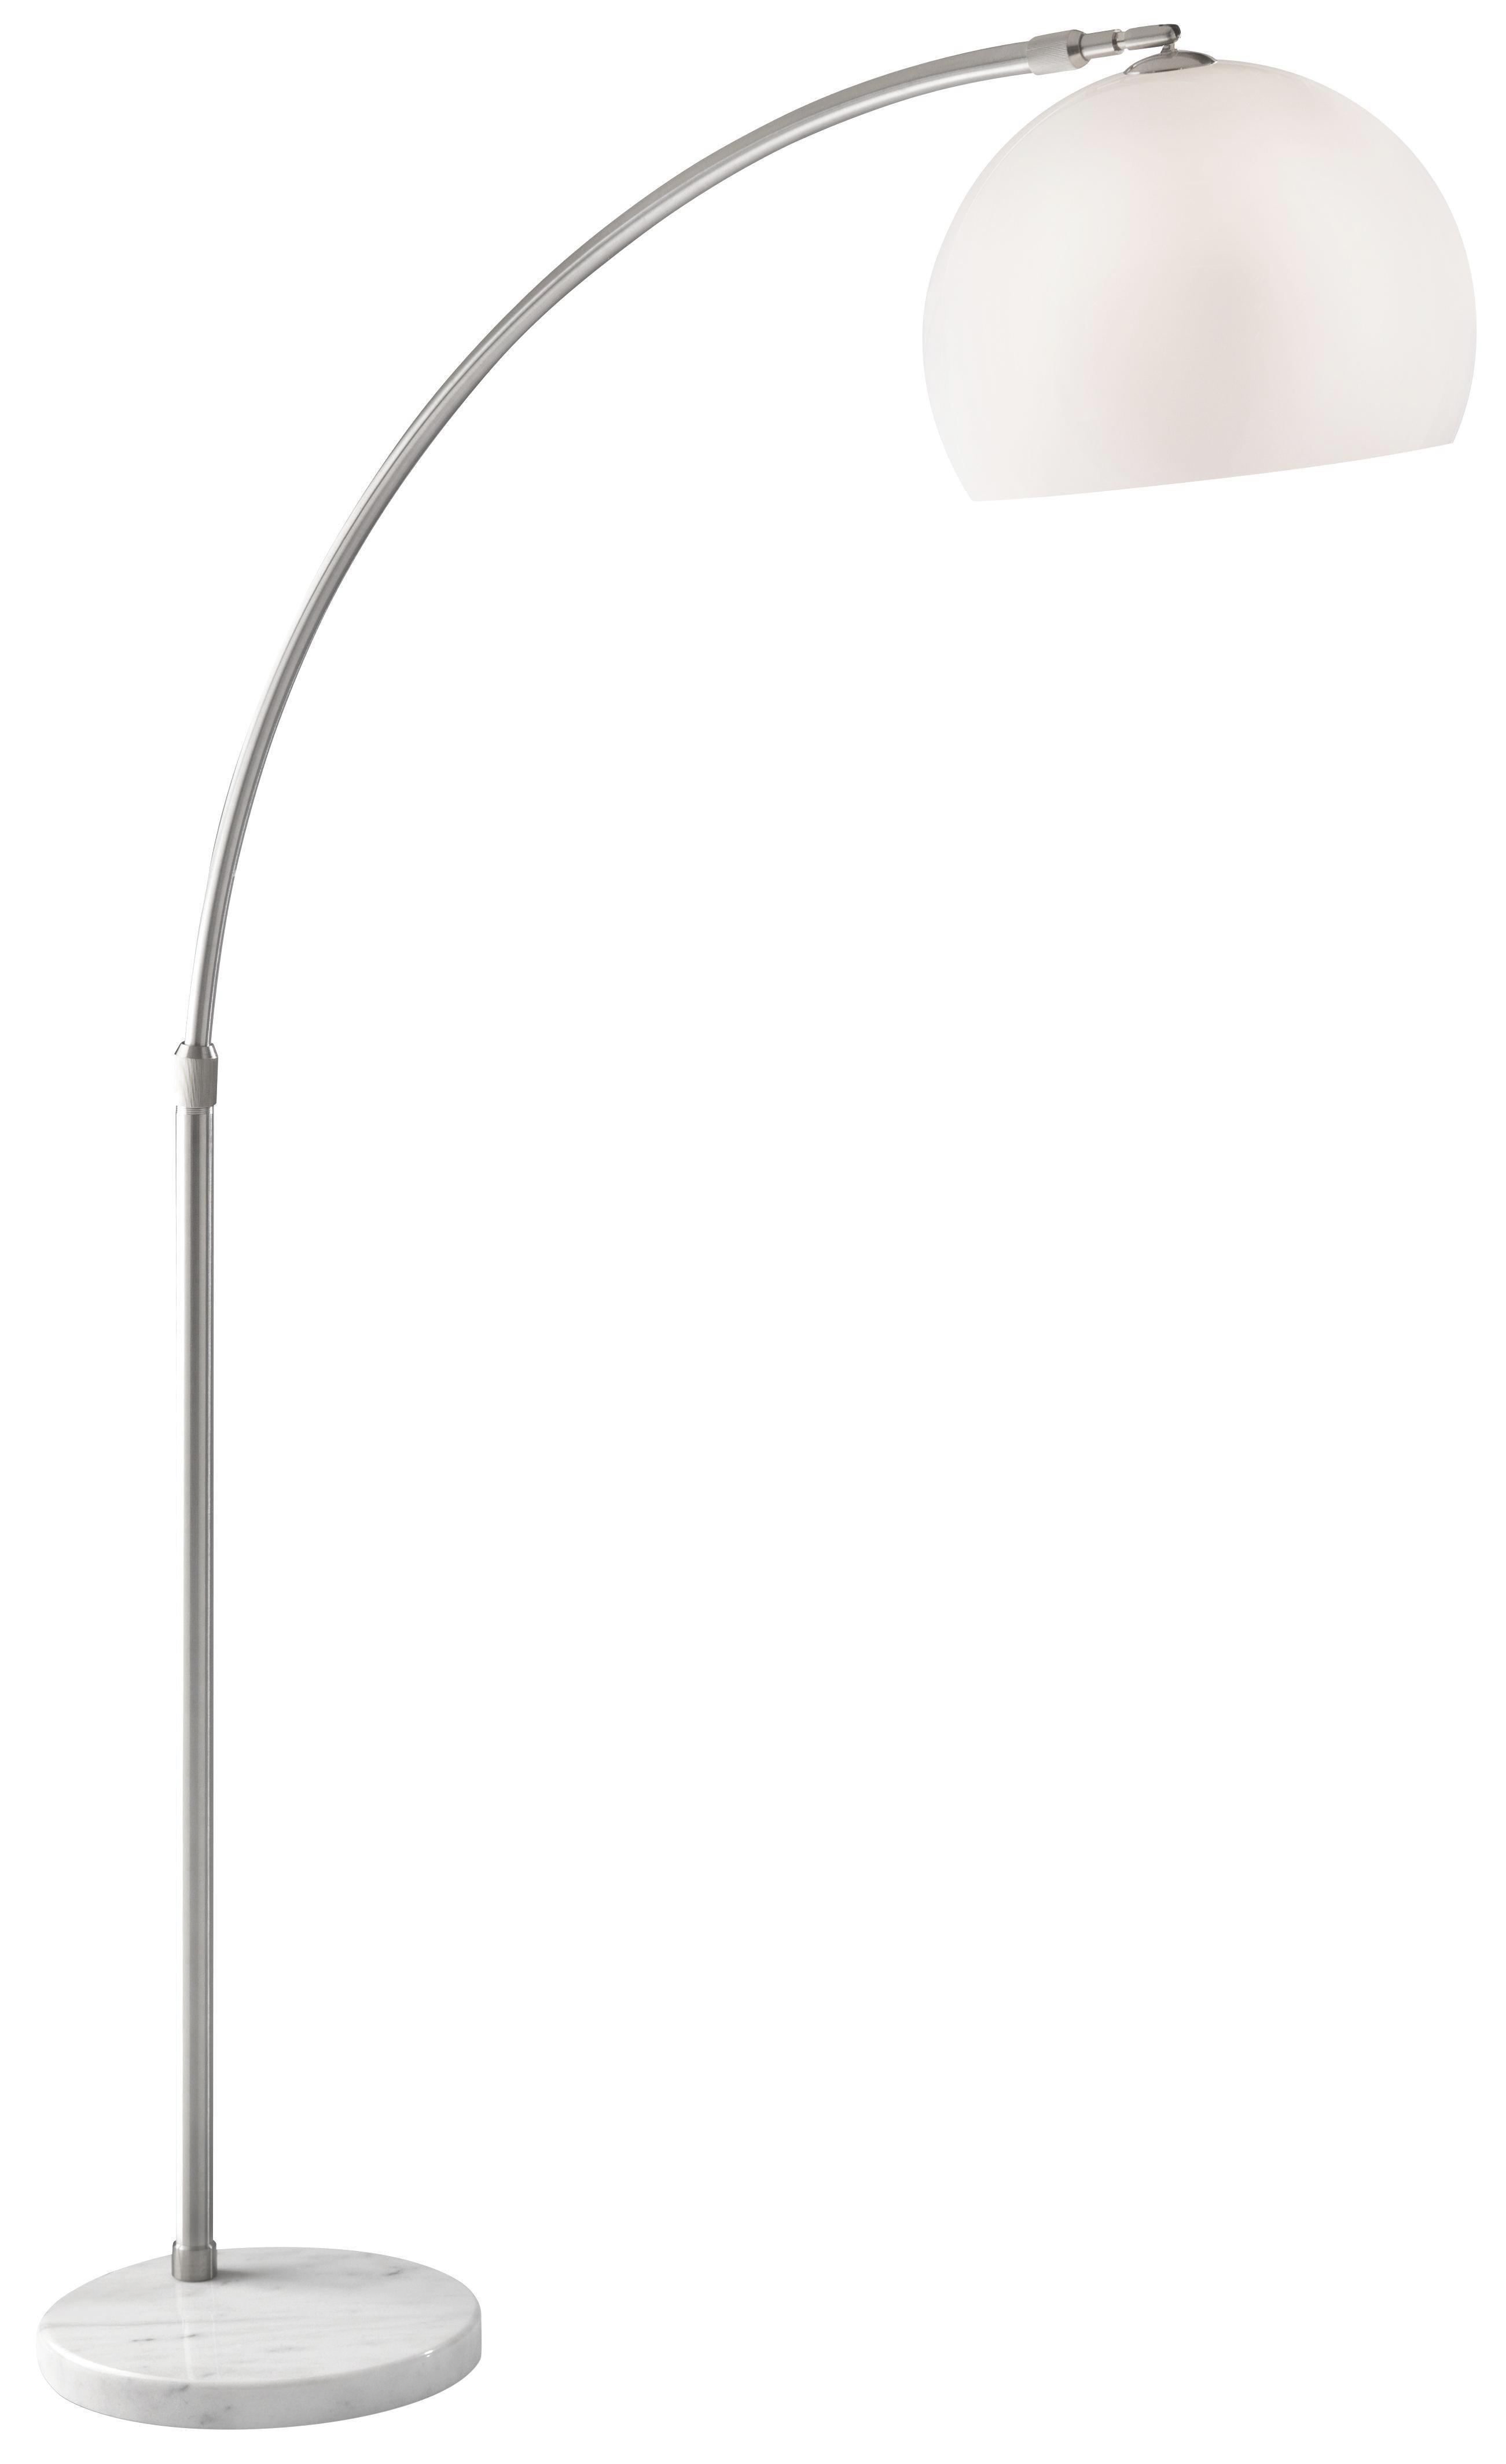 Stoječa Svetilka Scarlet - bela/srebrna, Moderno, kamen/kovina (180/200cm) - MÖMAX modern living